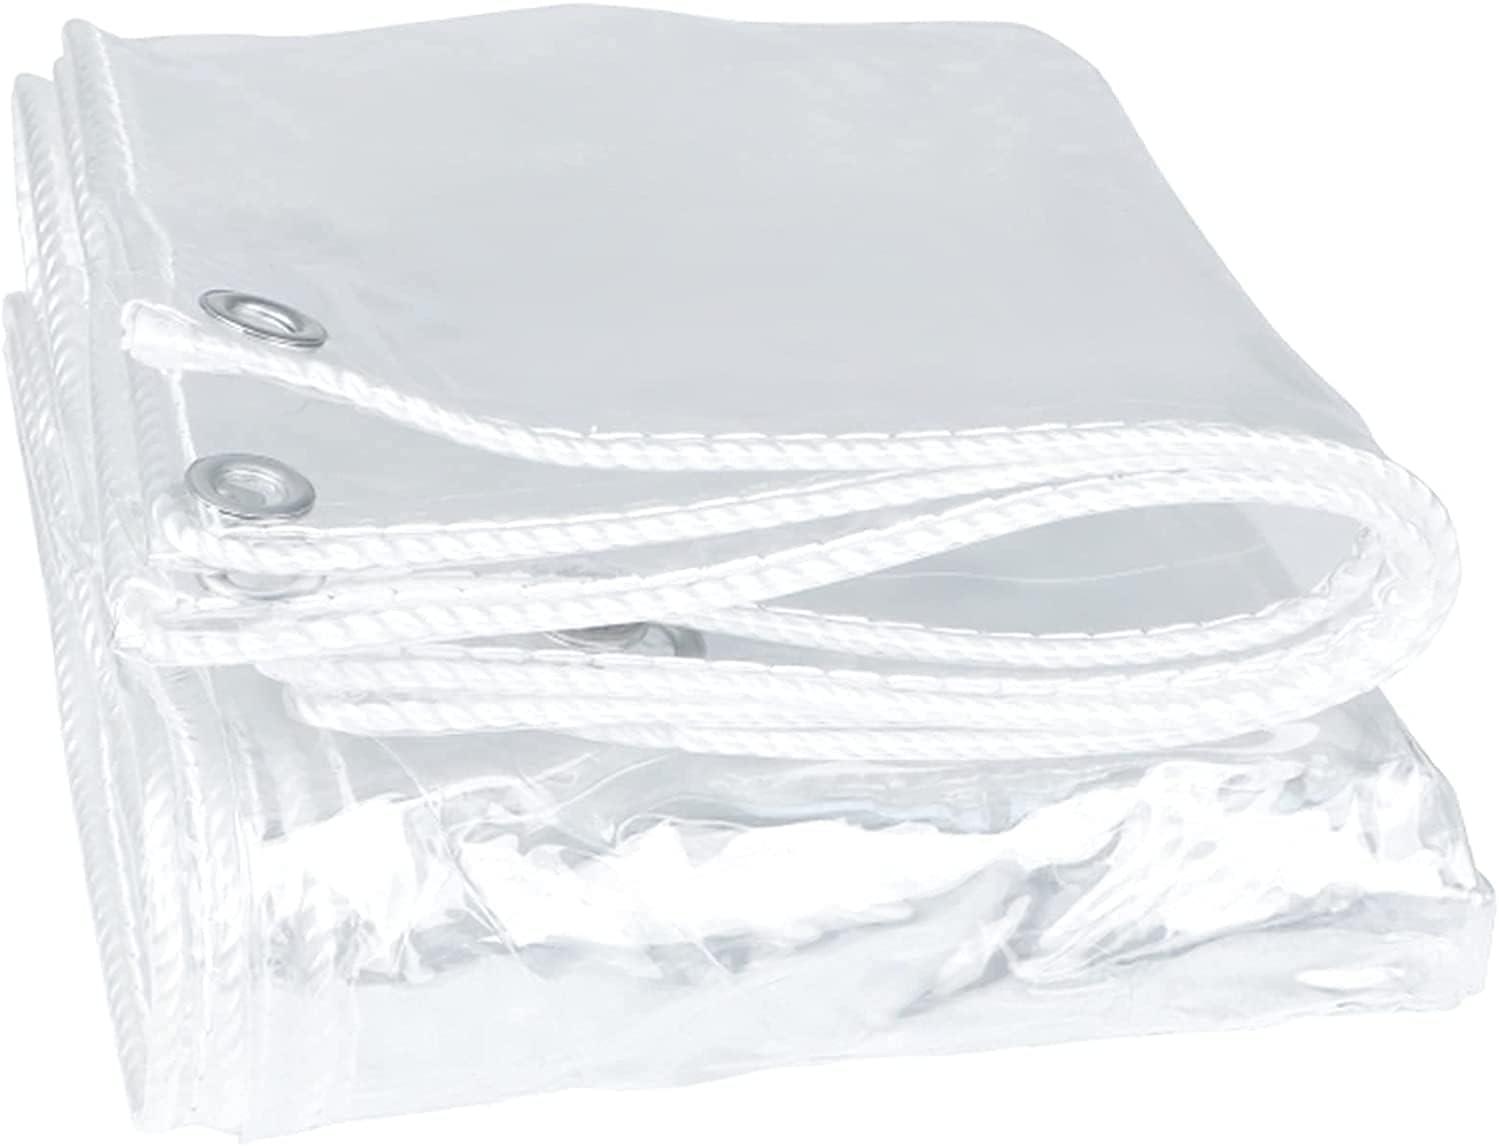 GUOTIAN Transparent Tarpaulin Heavy Max 89% OFF Duty Cover gift Waterproof Tarp 0